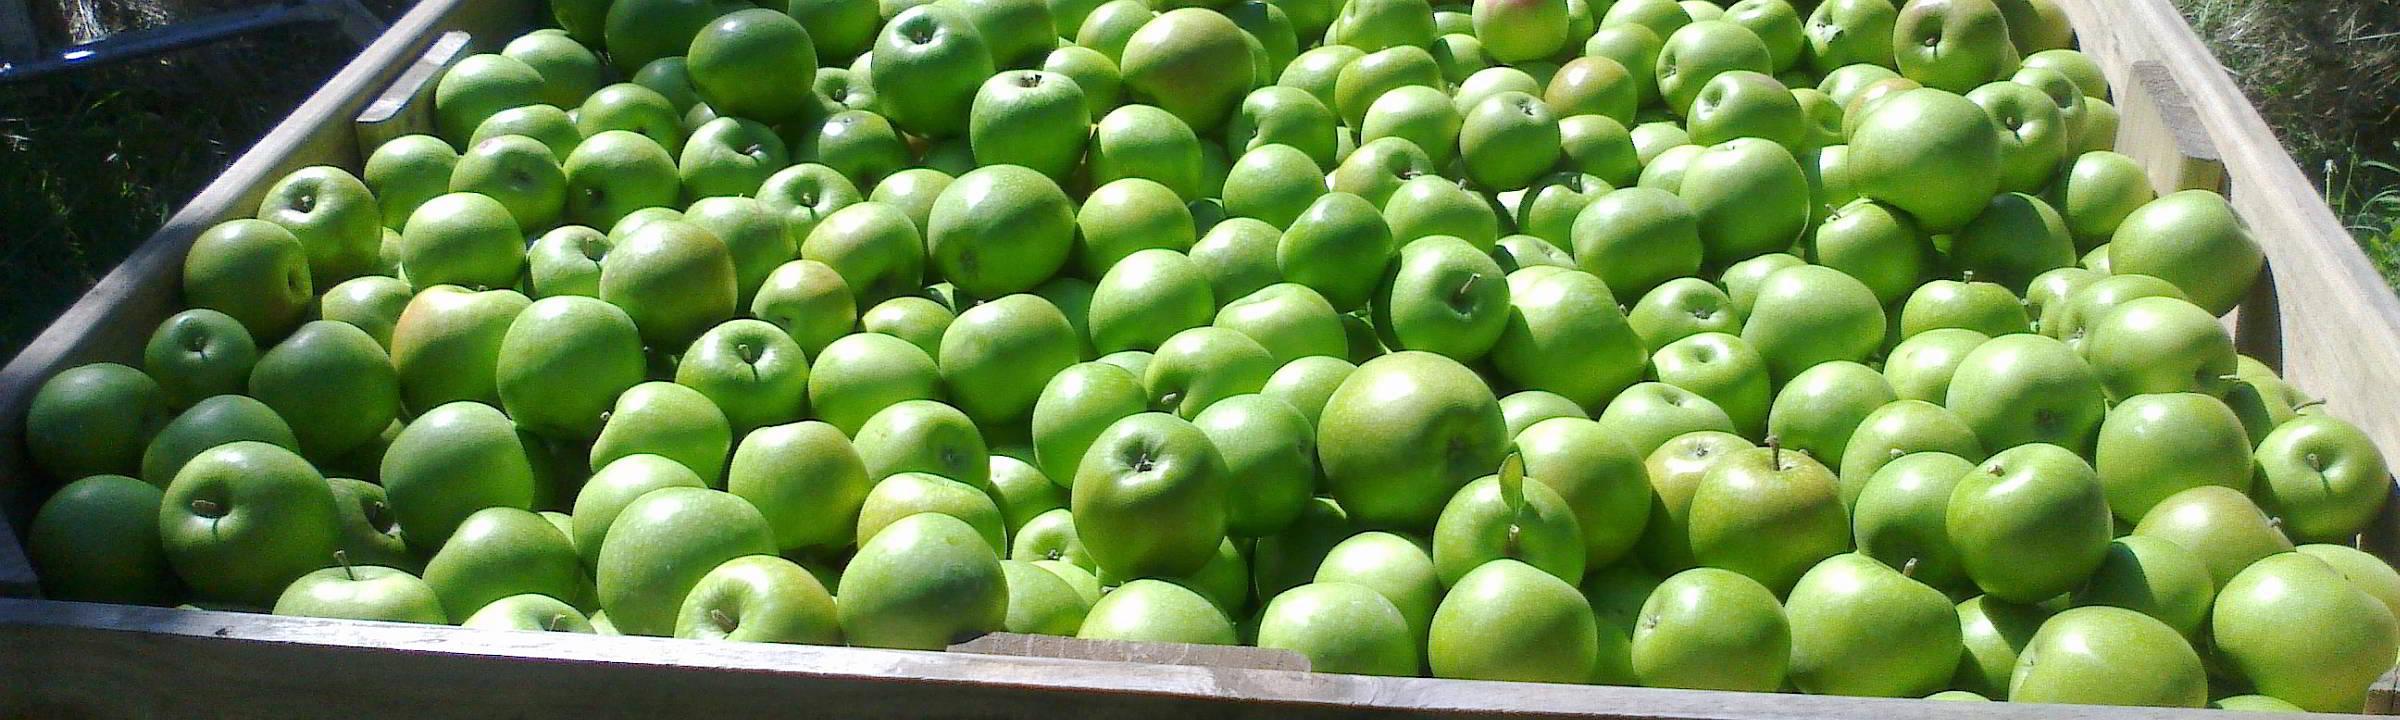 Apfelernte auf Neuseeland